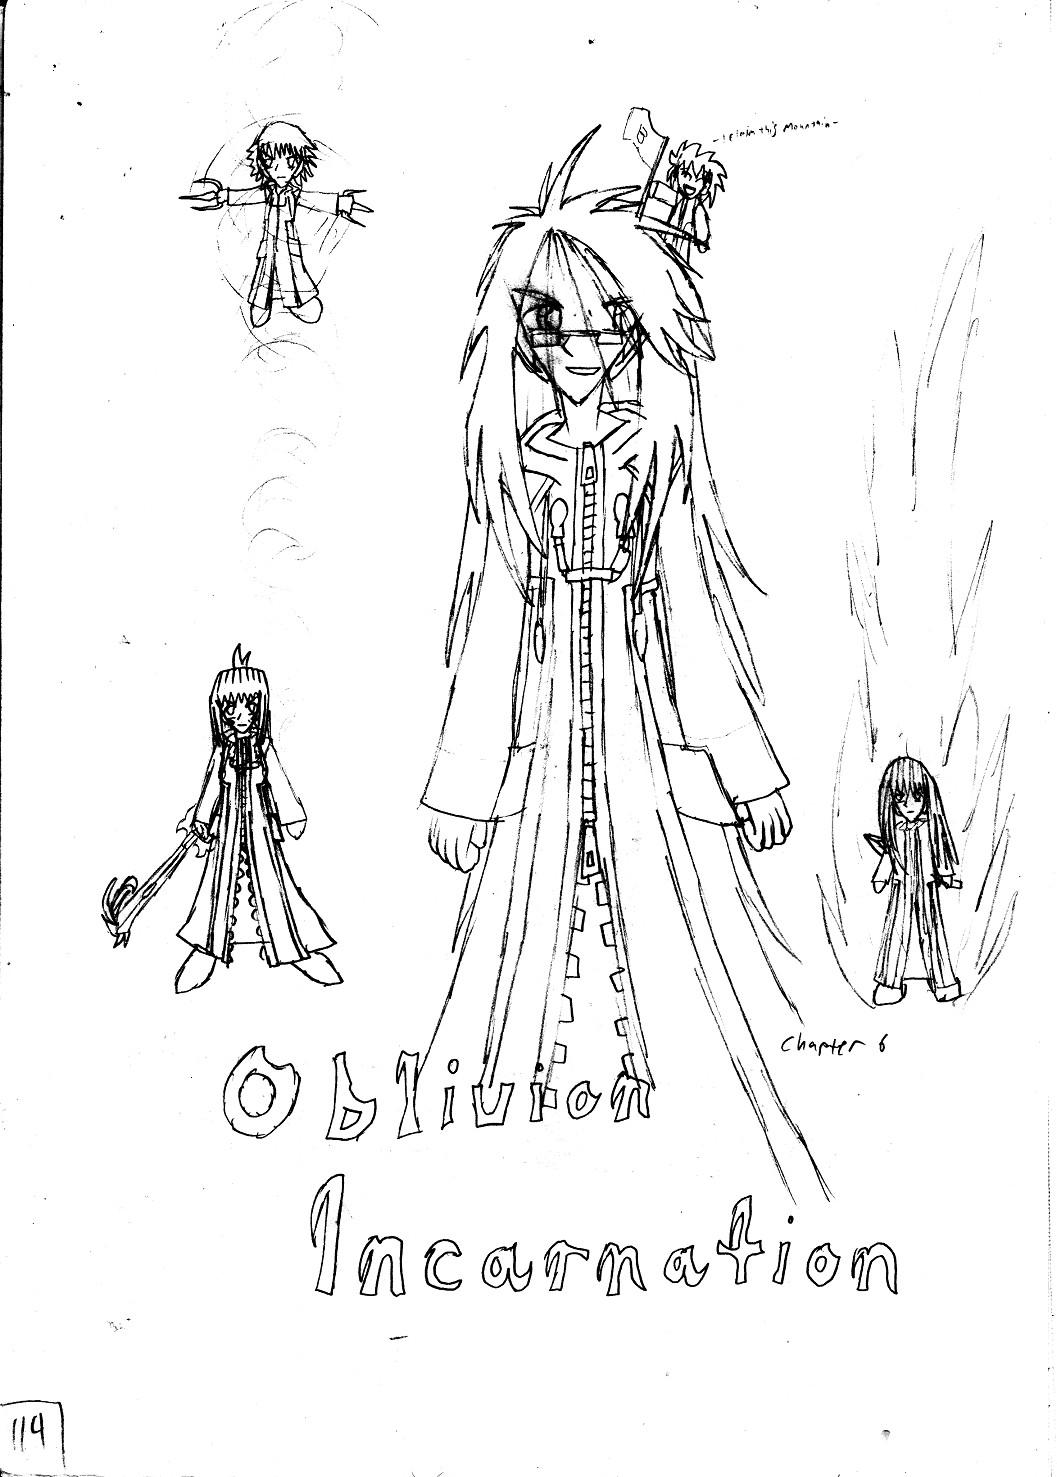 Kingdom Hearts Destined Waltz Page 114 by NIX